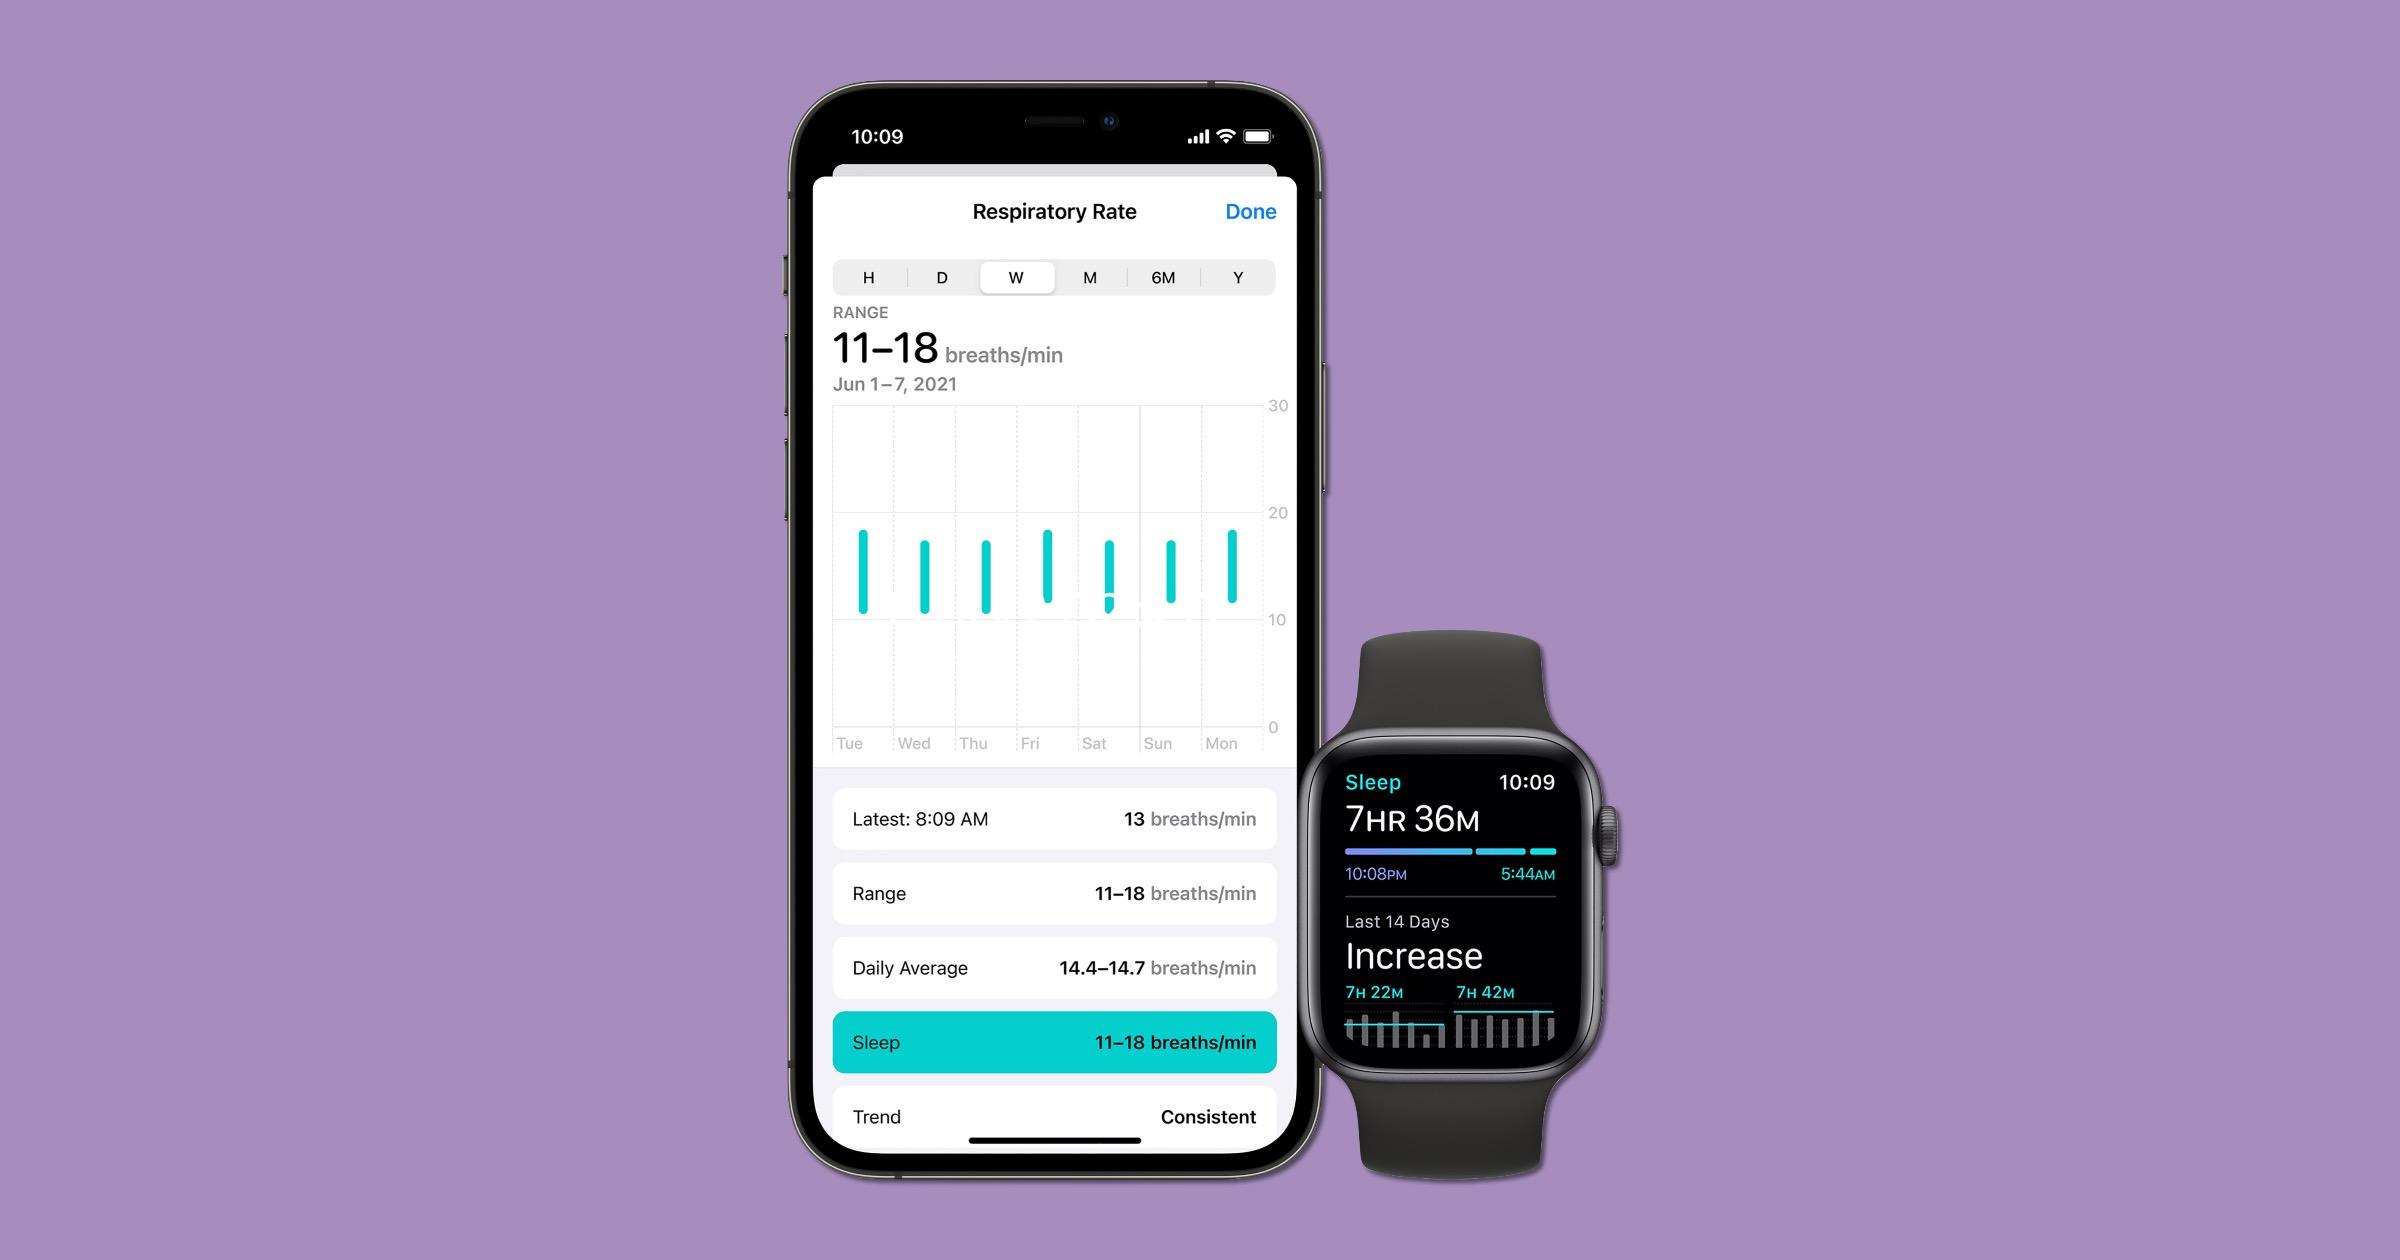 iOS 15 respiratory rate tracking